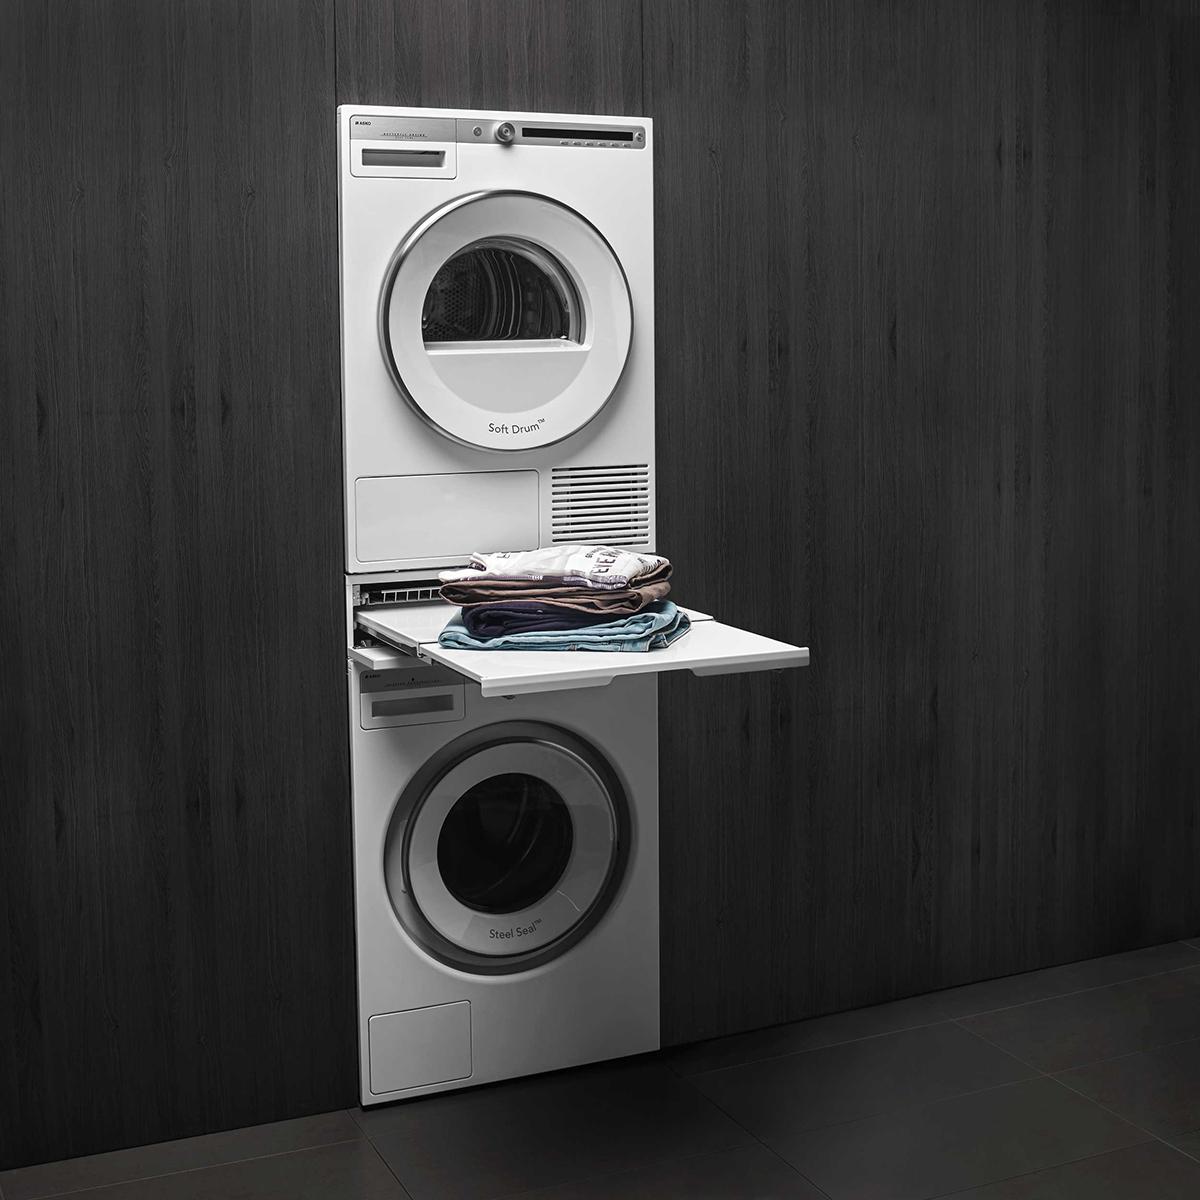 157989 file print ASKO Pro Home Laundry hidden helper double shelf basket white 1